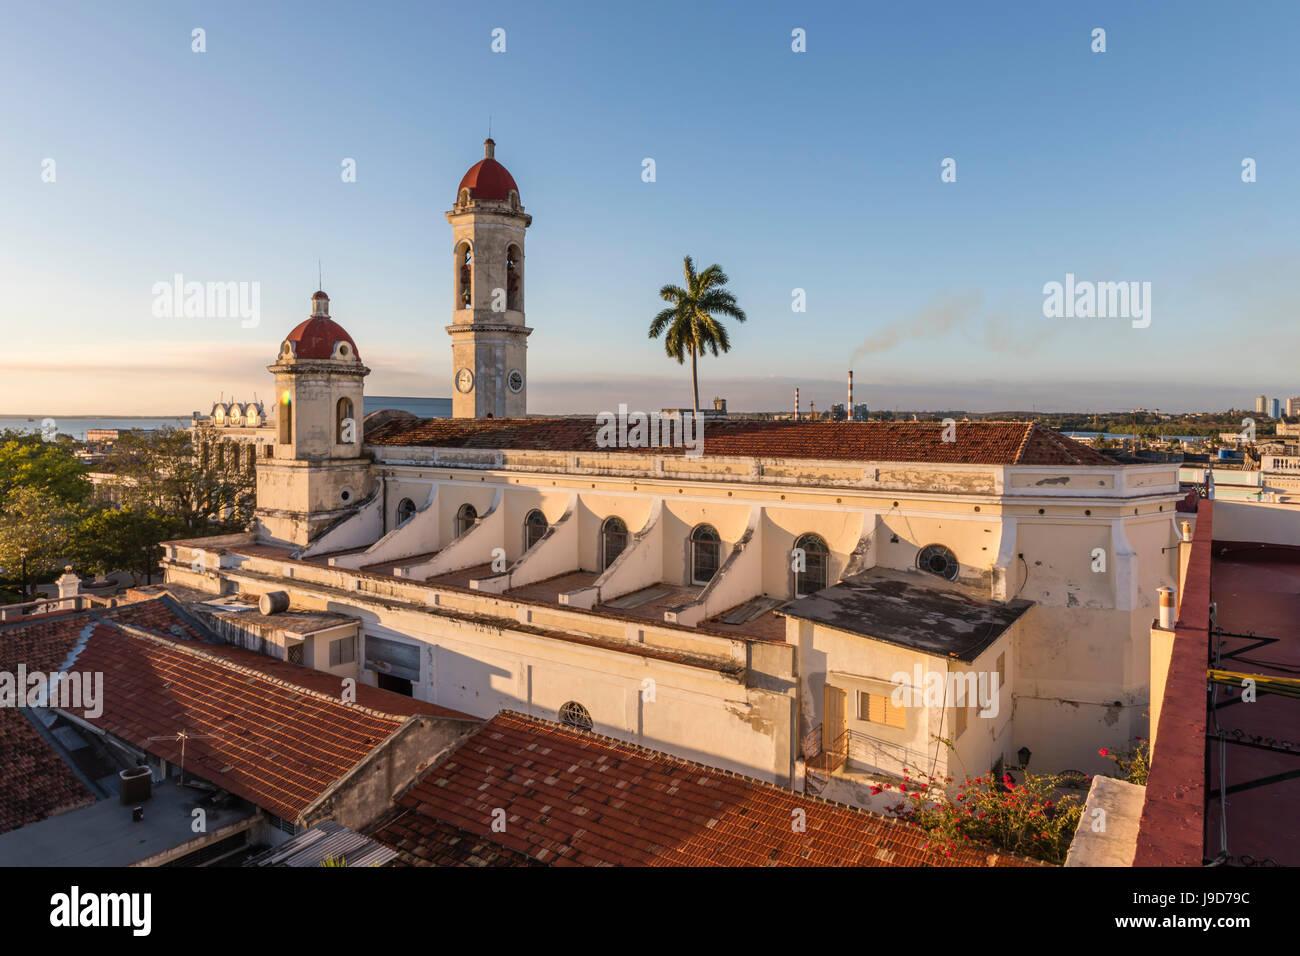 La Catedral de la Purisima Concepcion in Plaza José Marti, Cienfuegos, Sito Patrimonio Mondiale dell'UNESCO, Cuba, West Indies, dei Caraibi Foto Stock